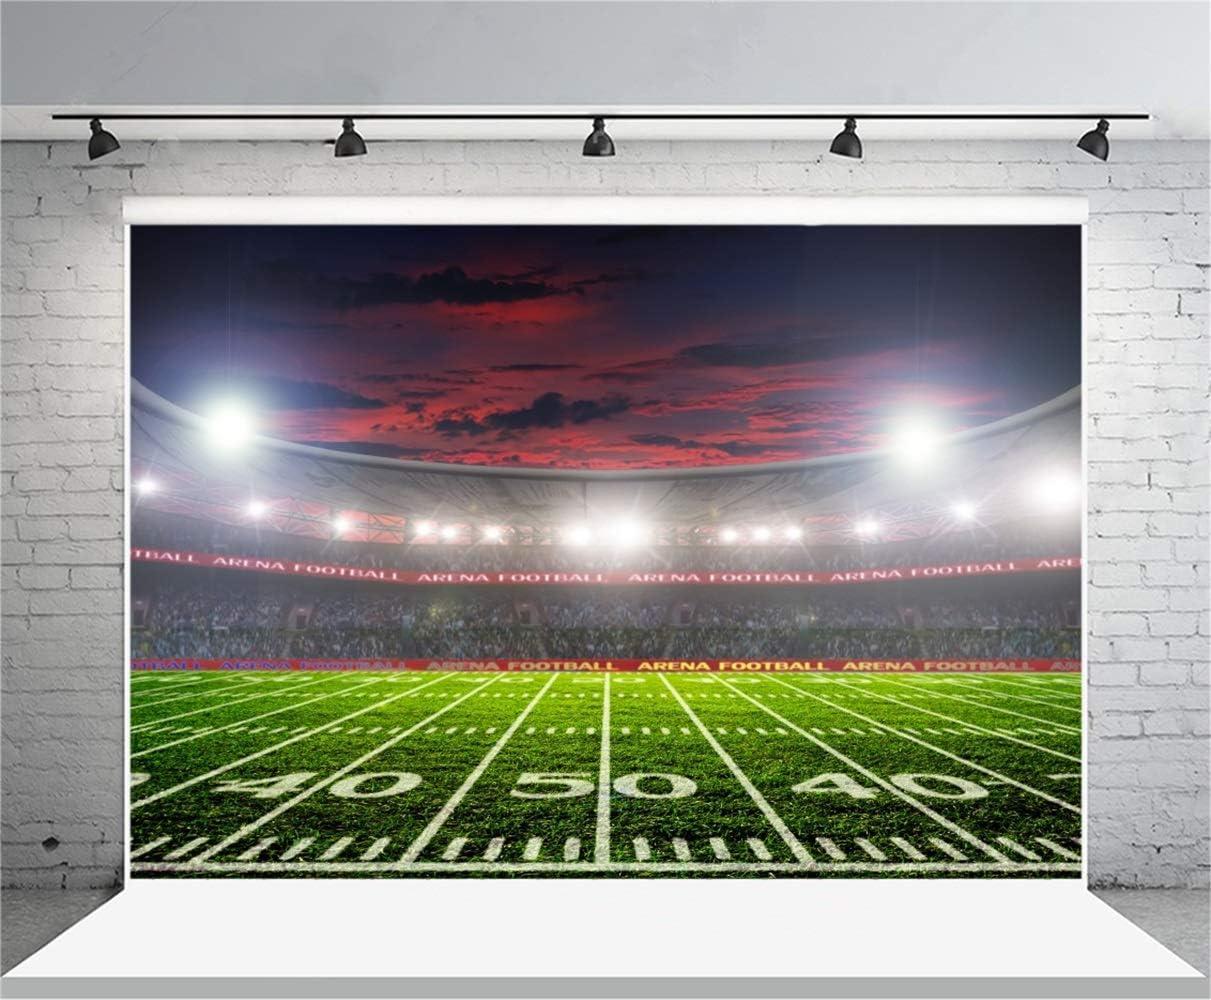 7x5ft Football Stadium Backdrop Vinyl Photography Background Green Grassland Stadium Spotlight Grass Field Football Match Children Kids Adult Portrait Photo Video Studio Props